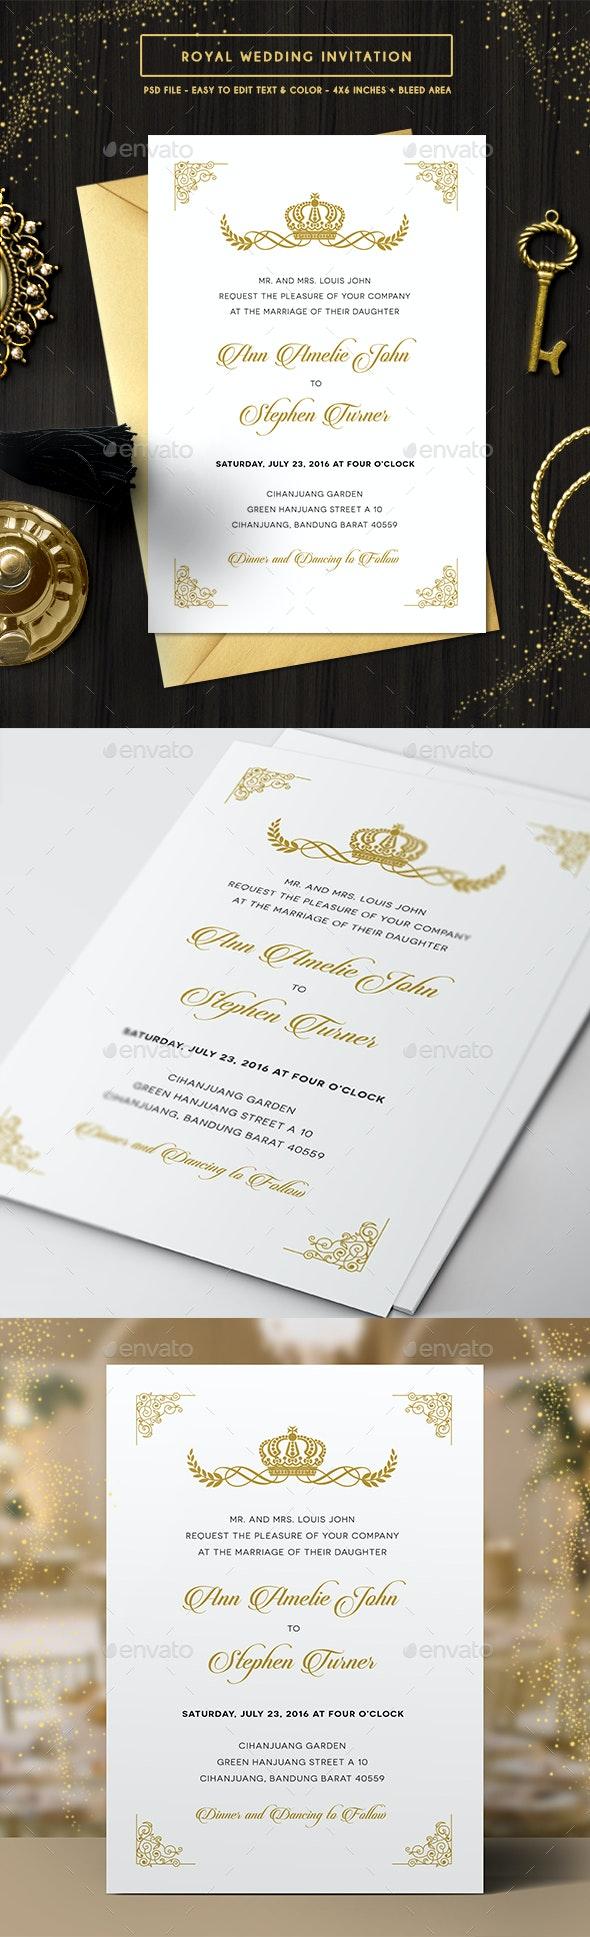 Royal Wedding Invitation - Weddings Cards & Invites